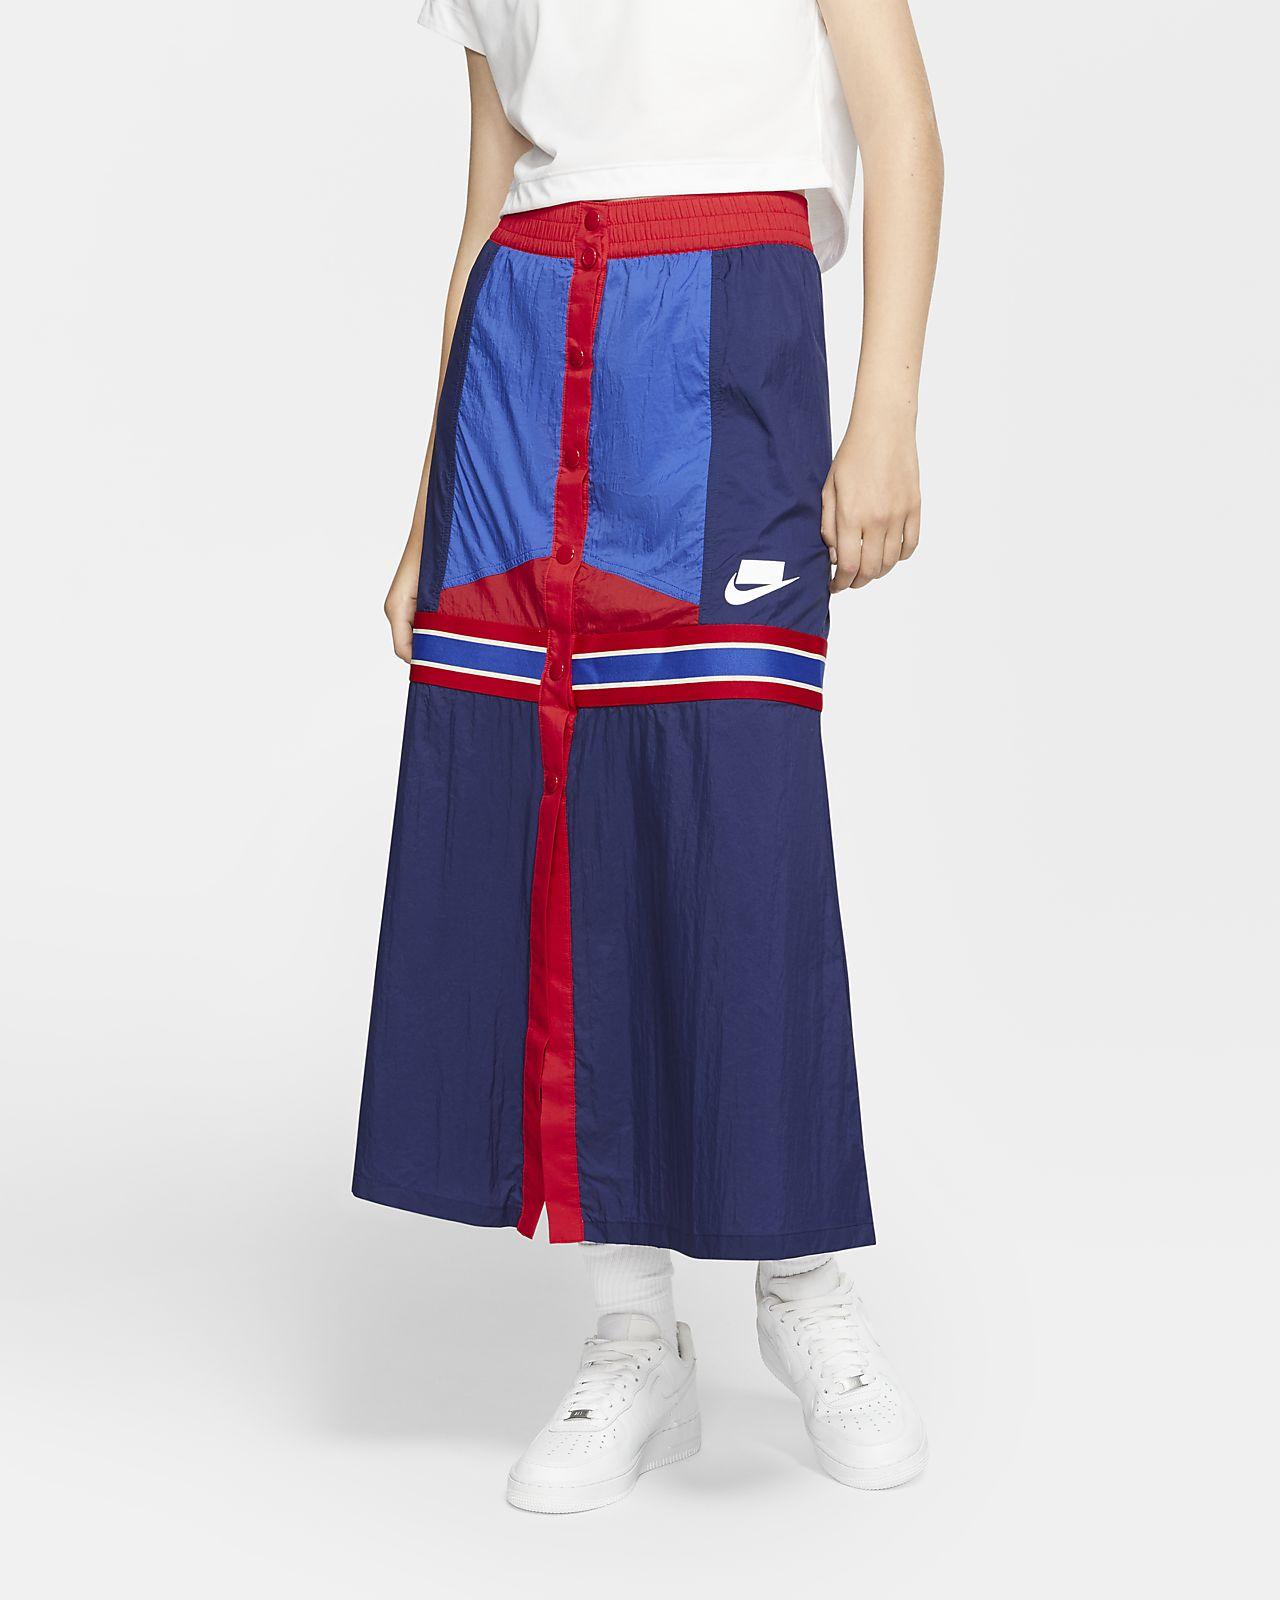 e611b017b4 Nike Sportswear NSW Women's Skirt. Nike.com CA